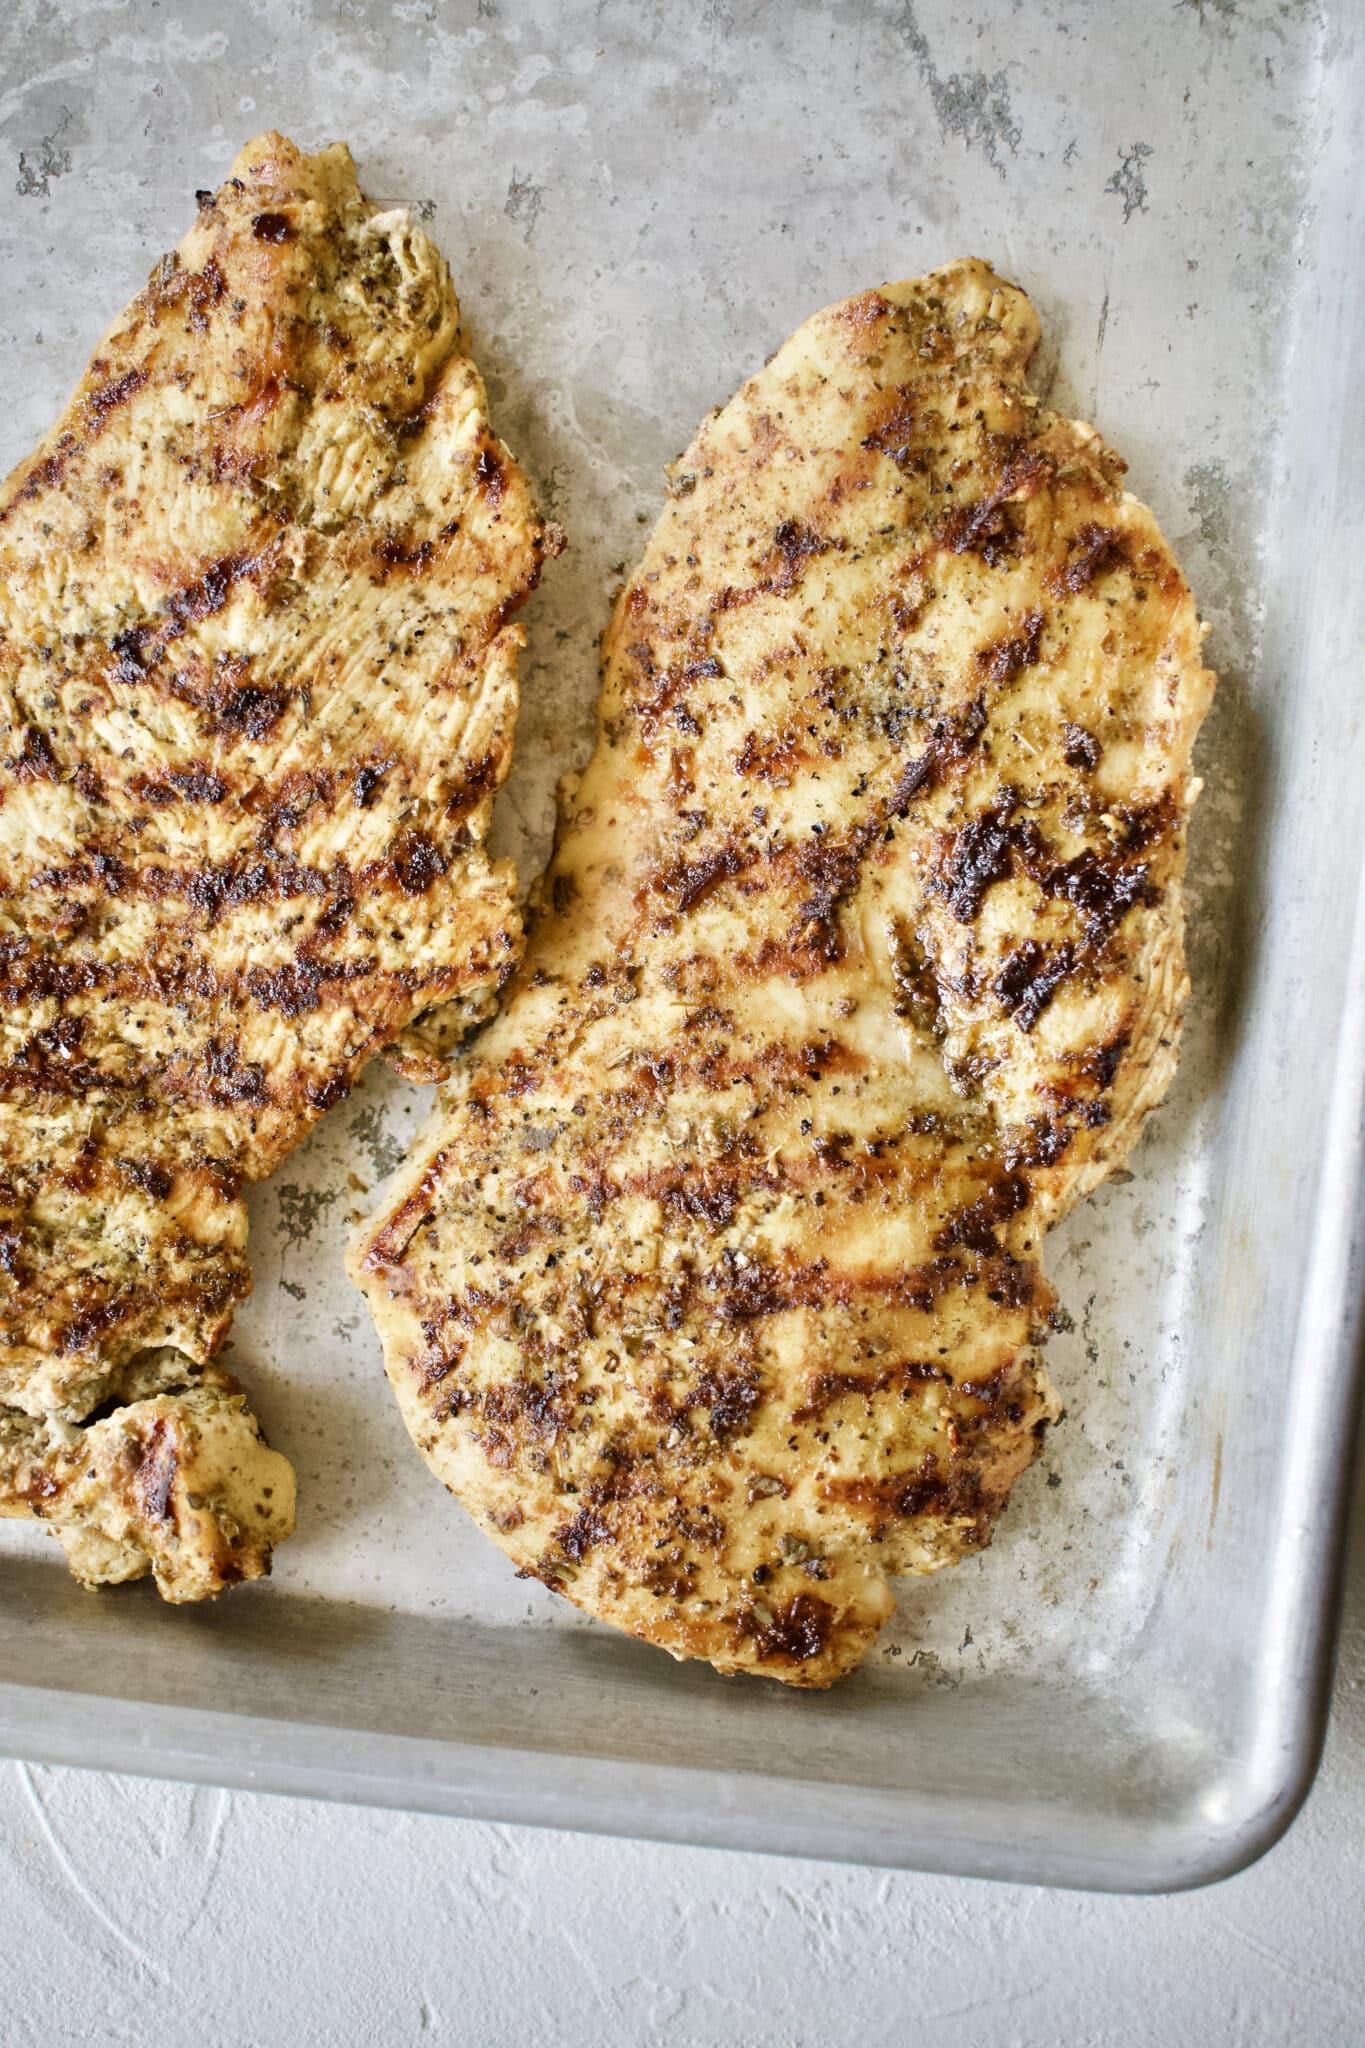 Quick Greek Chicken grilled using my Perfect Grilled Chicken method.